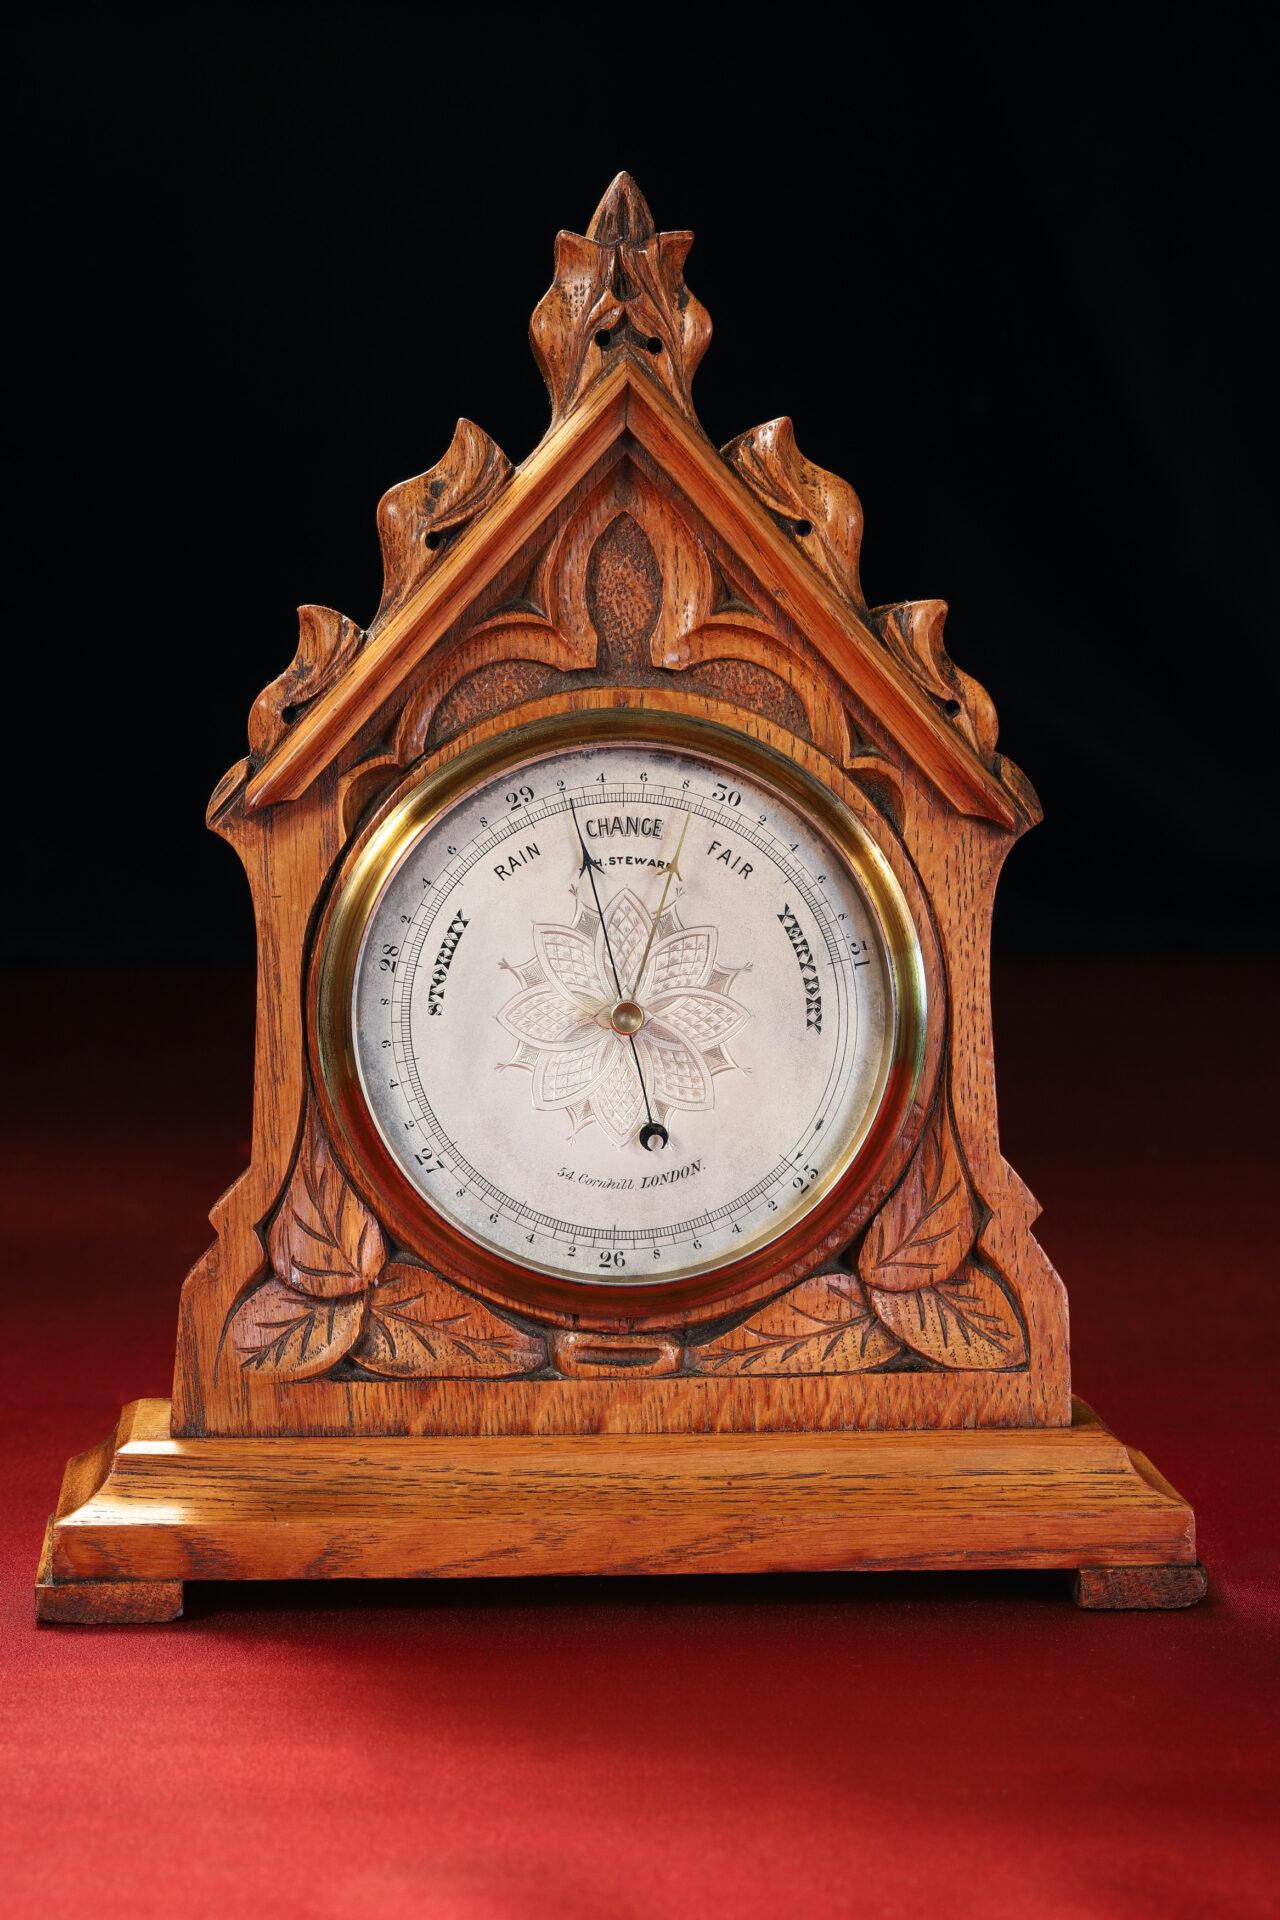 Image of JH Steward Gothic Mantle Barometer c1880